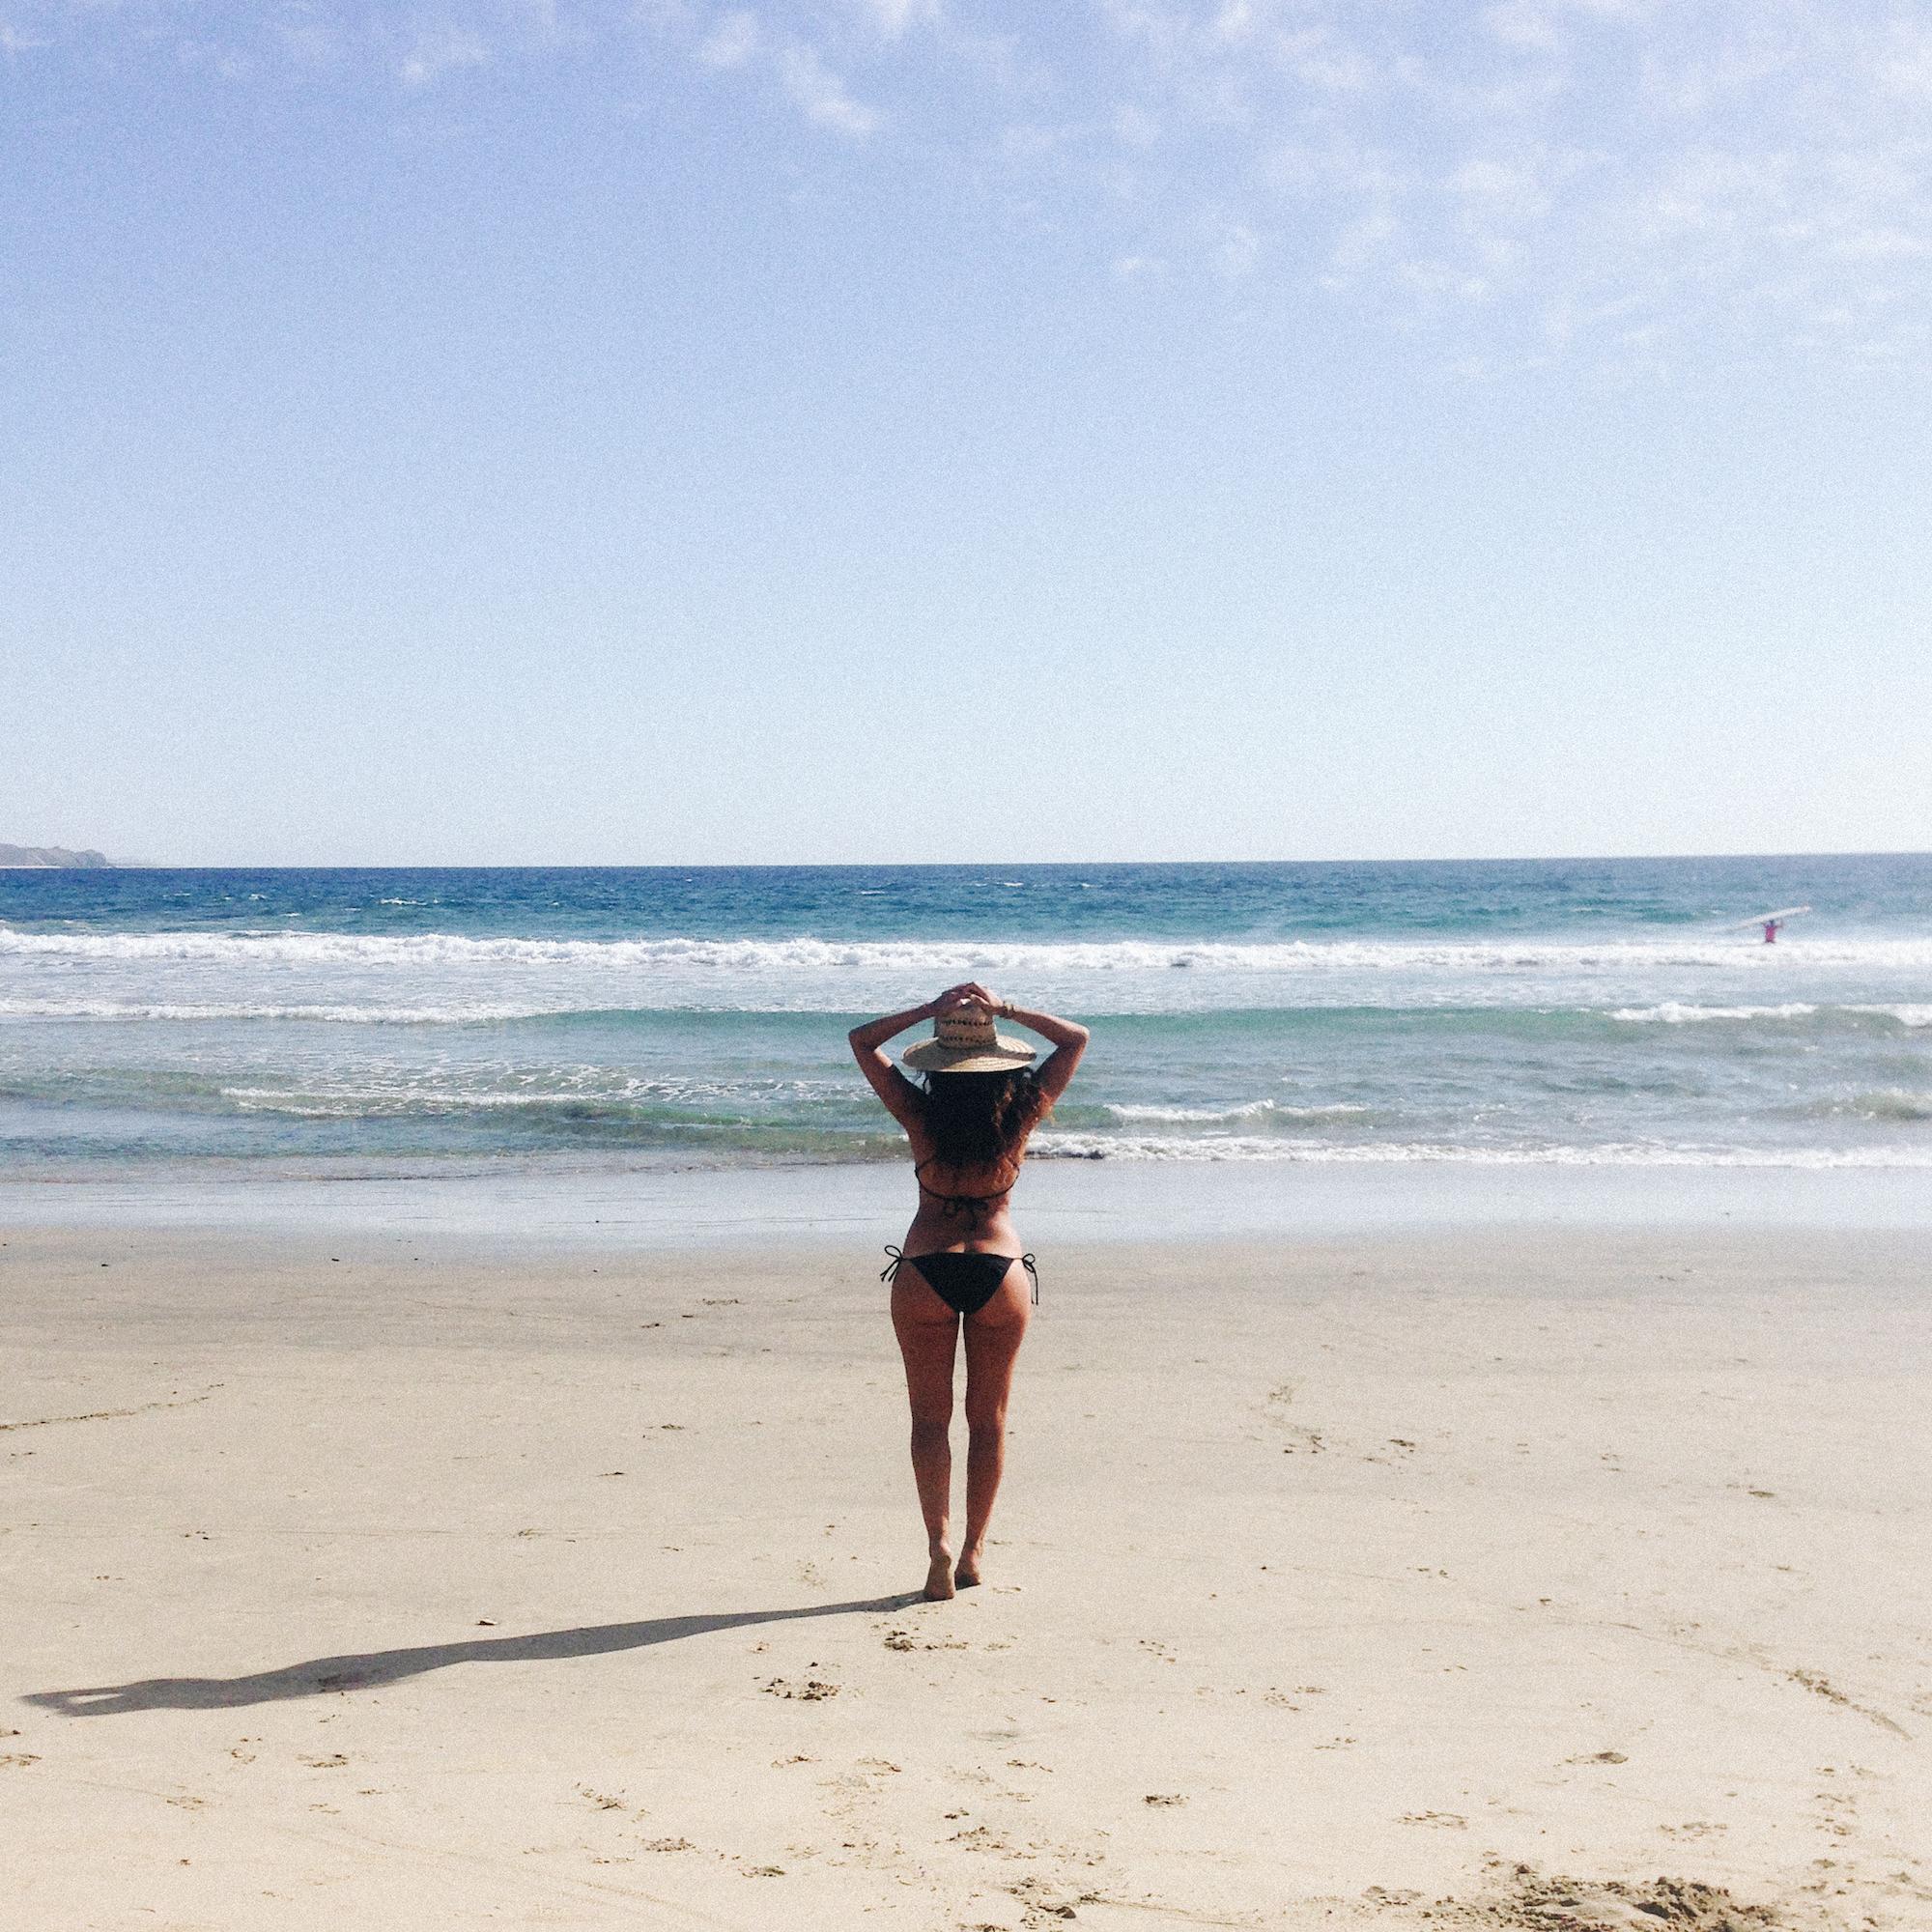 South Pacific Beaches: Surfing Playa Los Cerritos